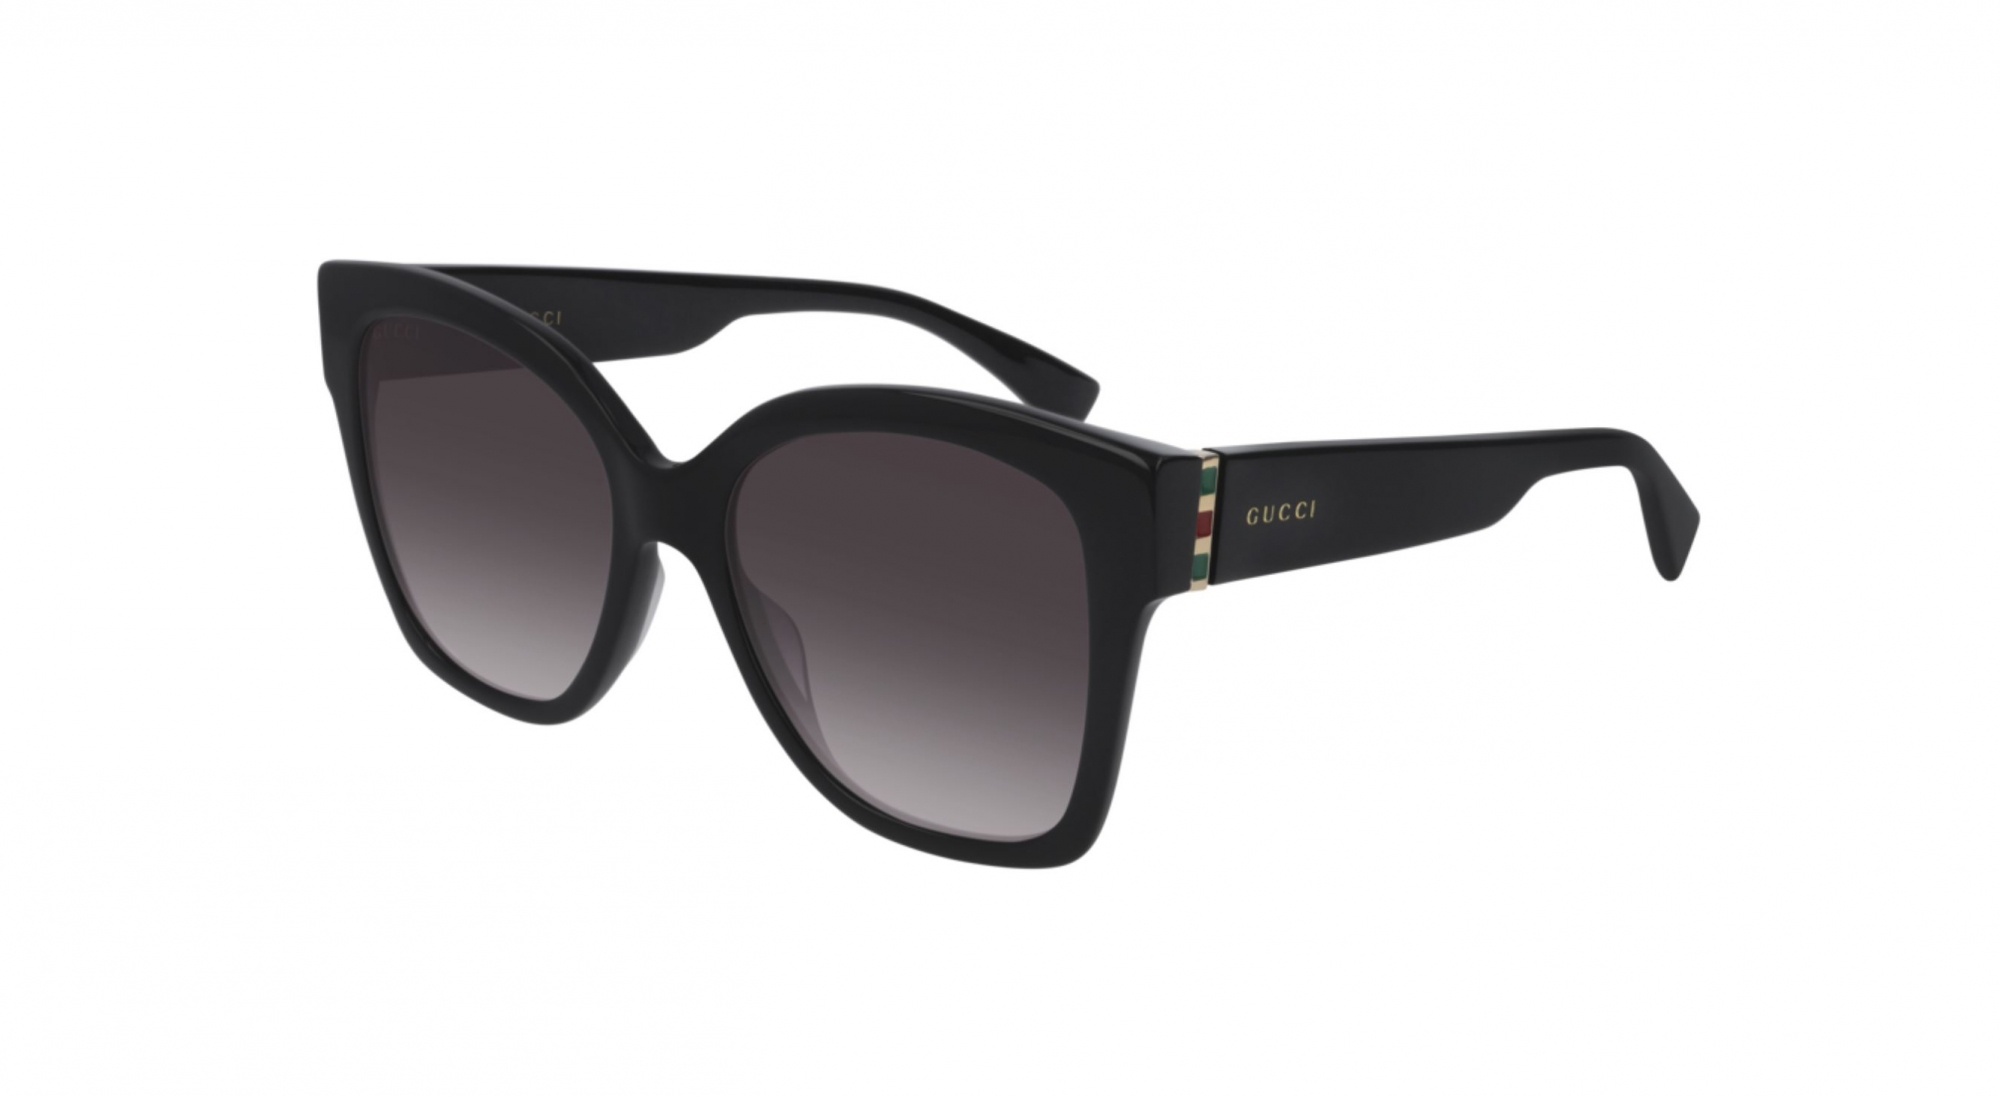 a940a2df Gucci WEB GG0459S WEB GG 0459S 001 Black